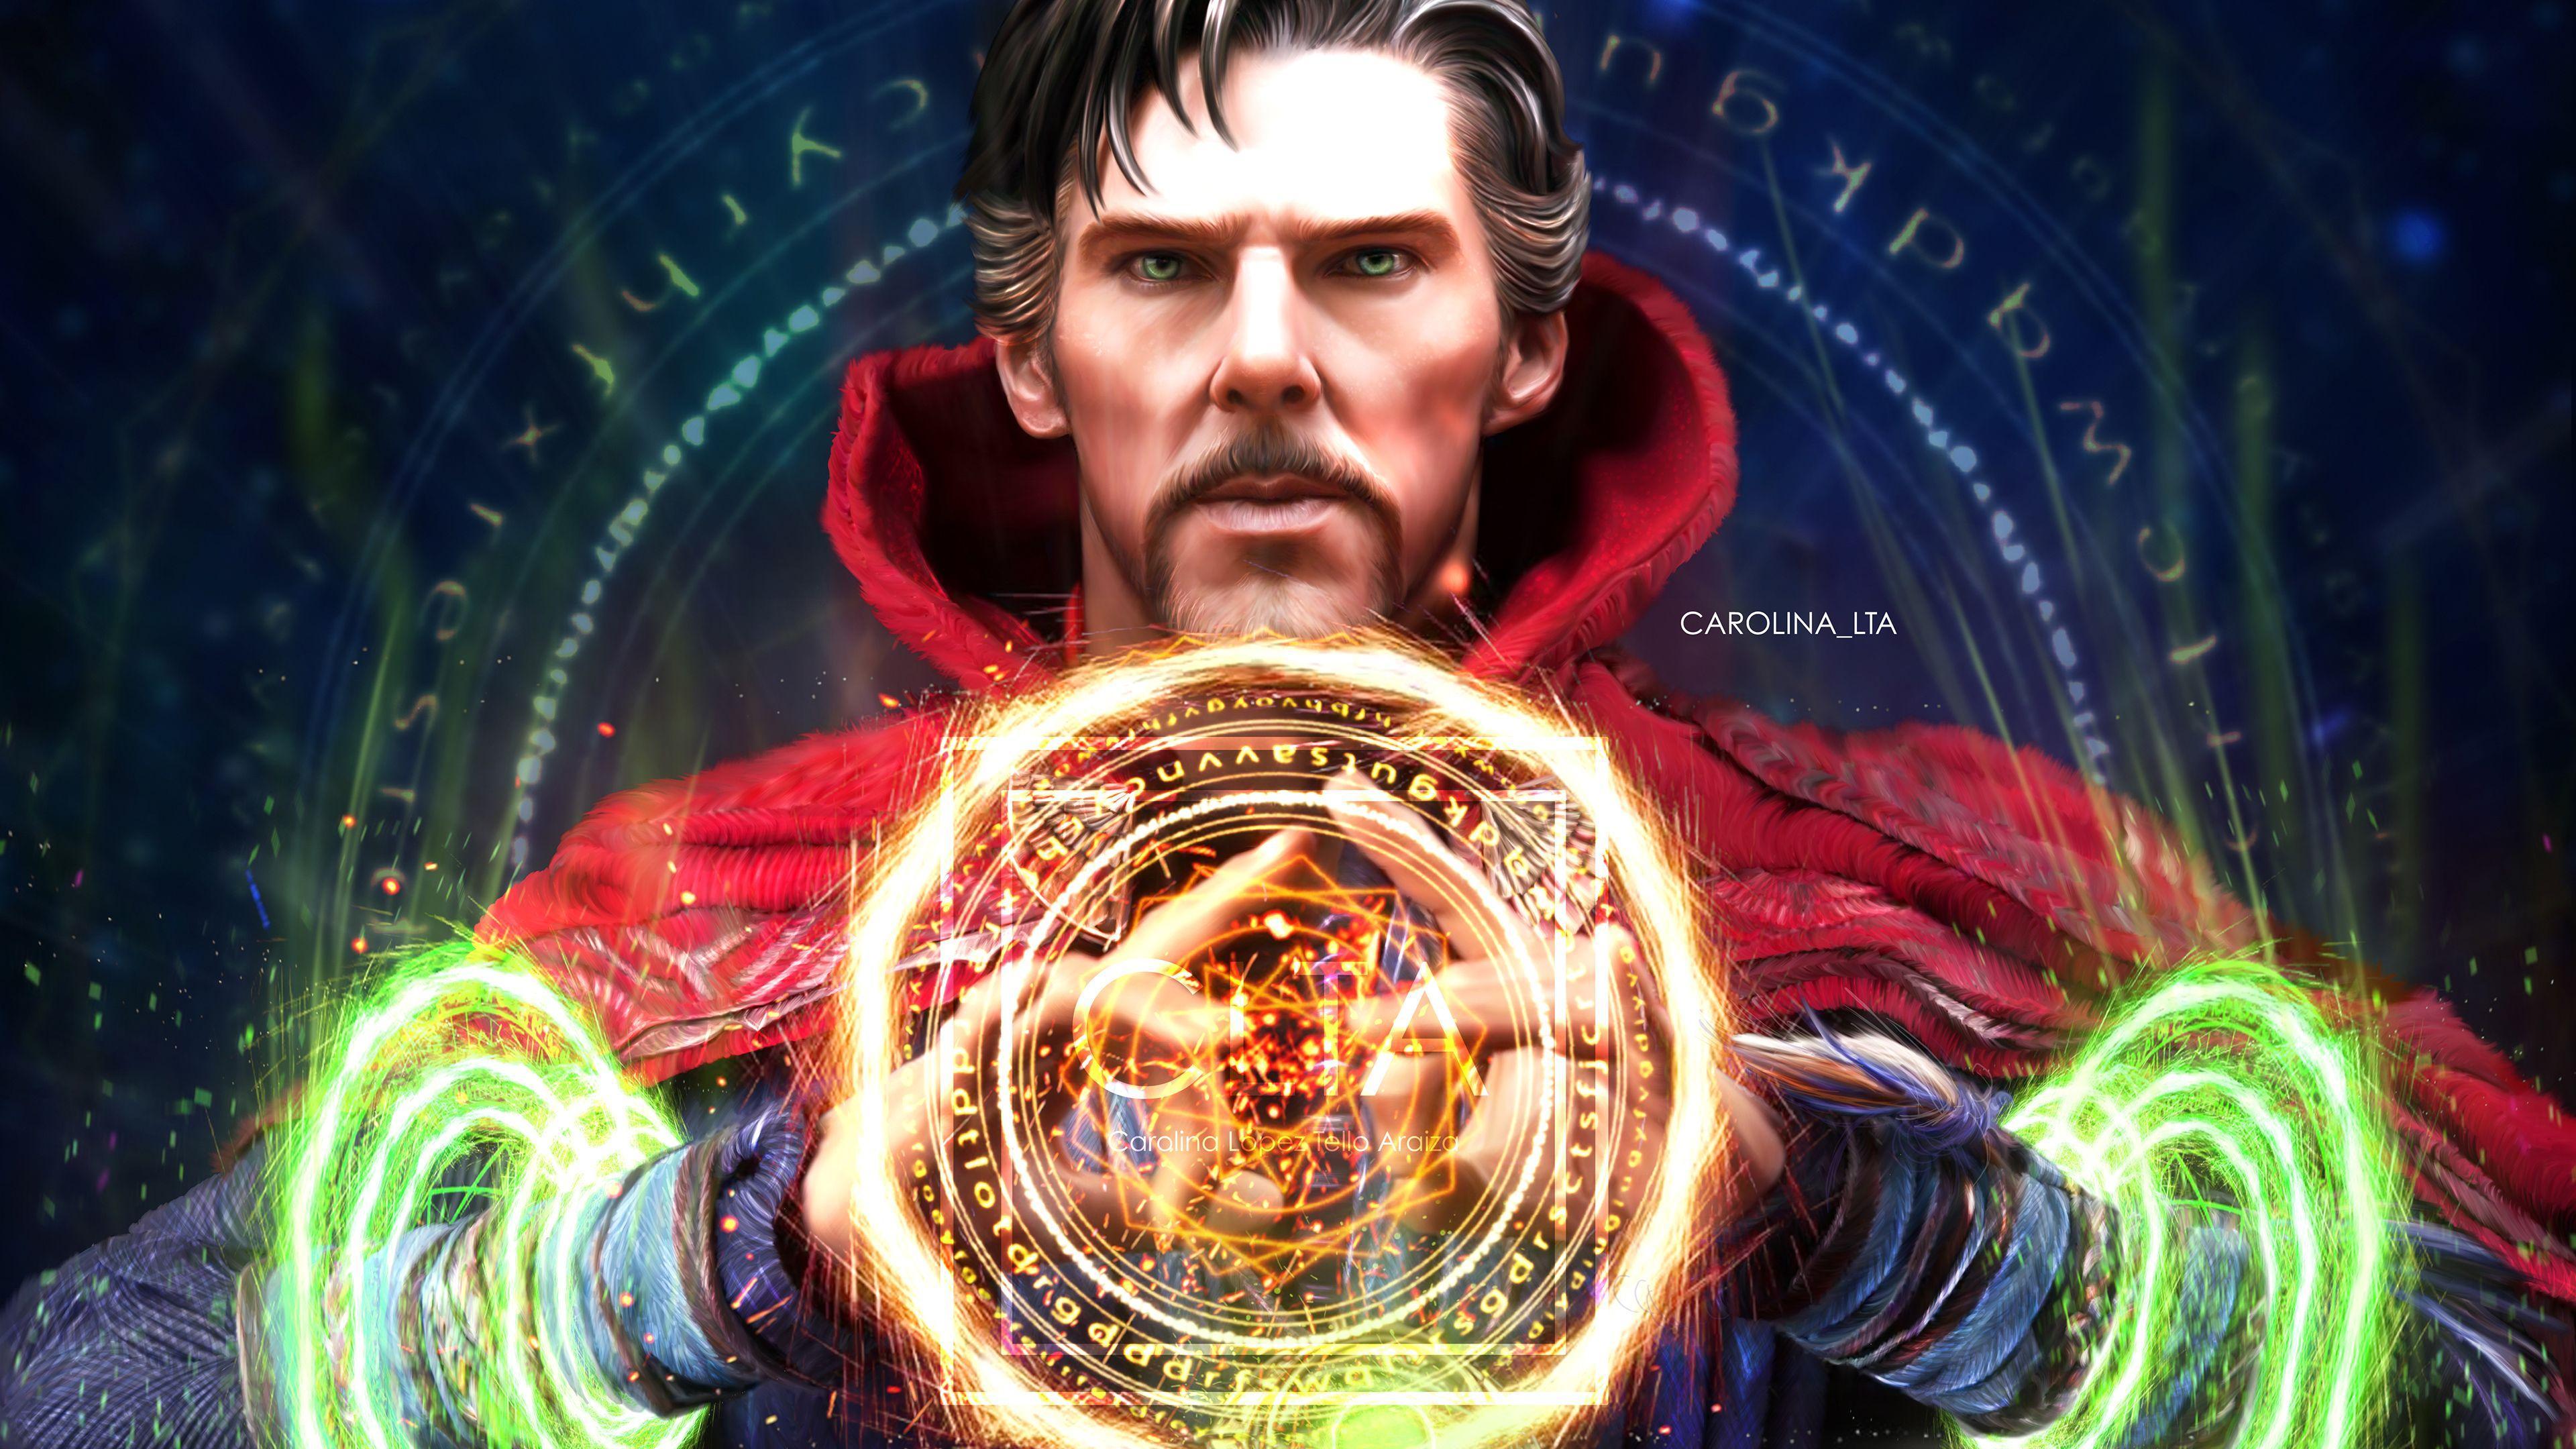 Doctor Strange Wallpapers - Top Free Doctor Strange ...